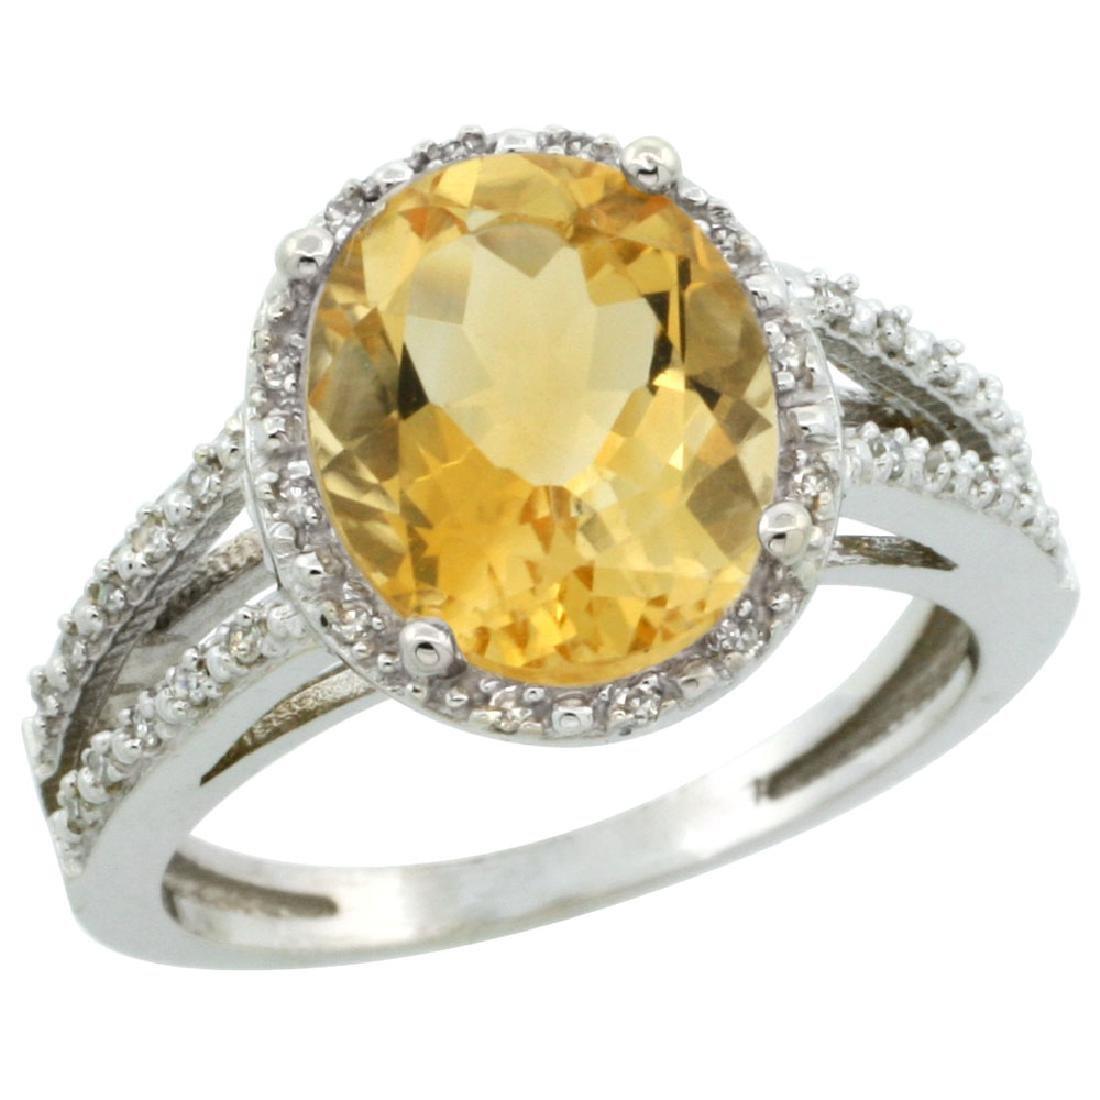 Natural 3.47 ctw Citrine & Diamond Engagement Ring 14K